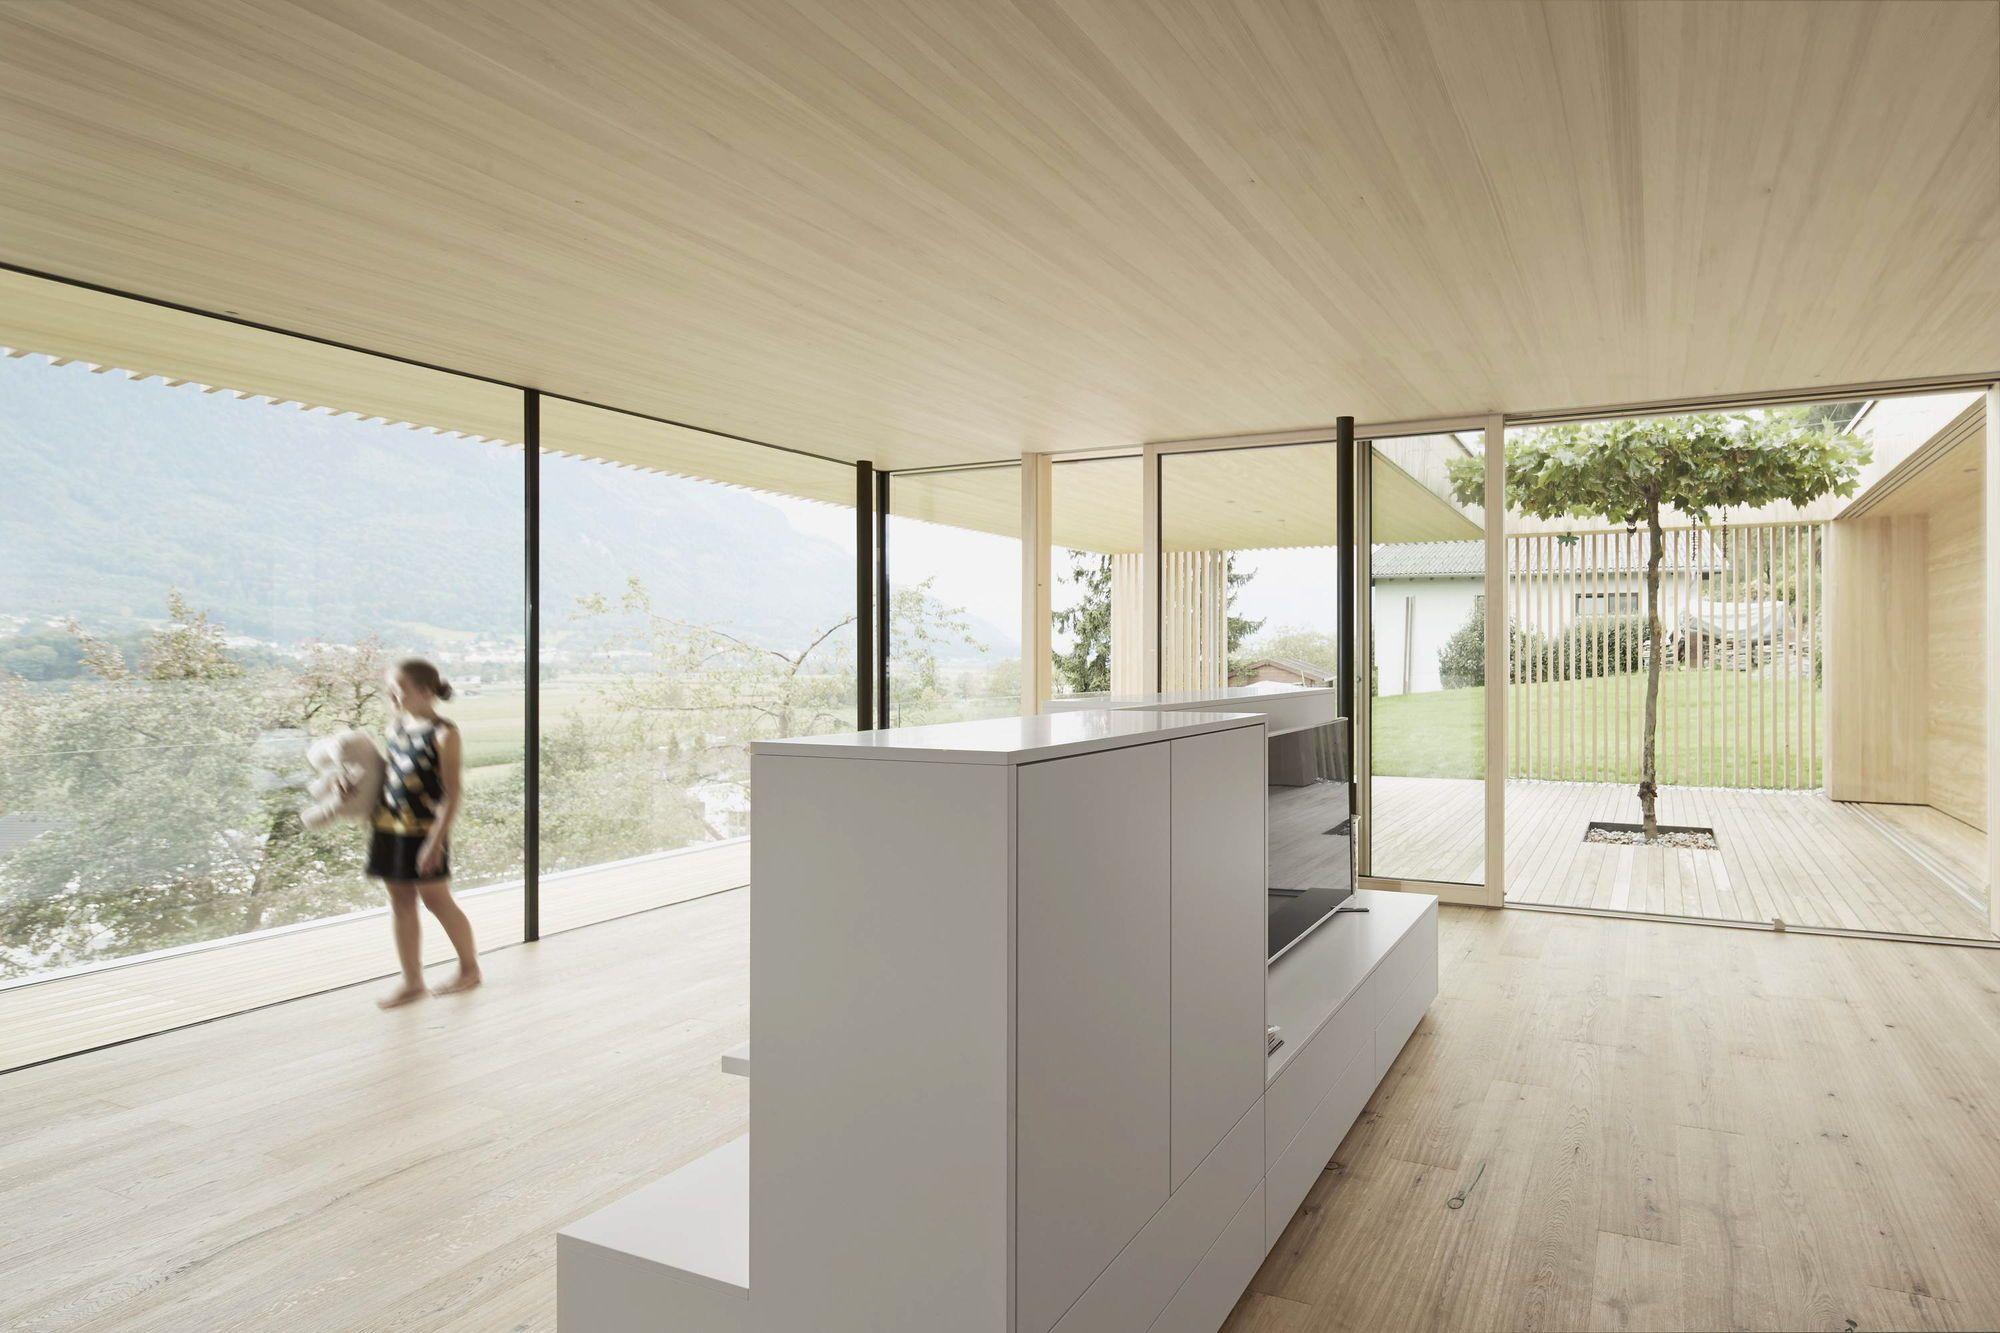 Haus am Fels, Feldkirch | Vorarlberger Holzbaukunst ...